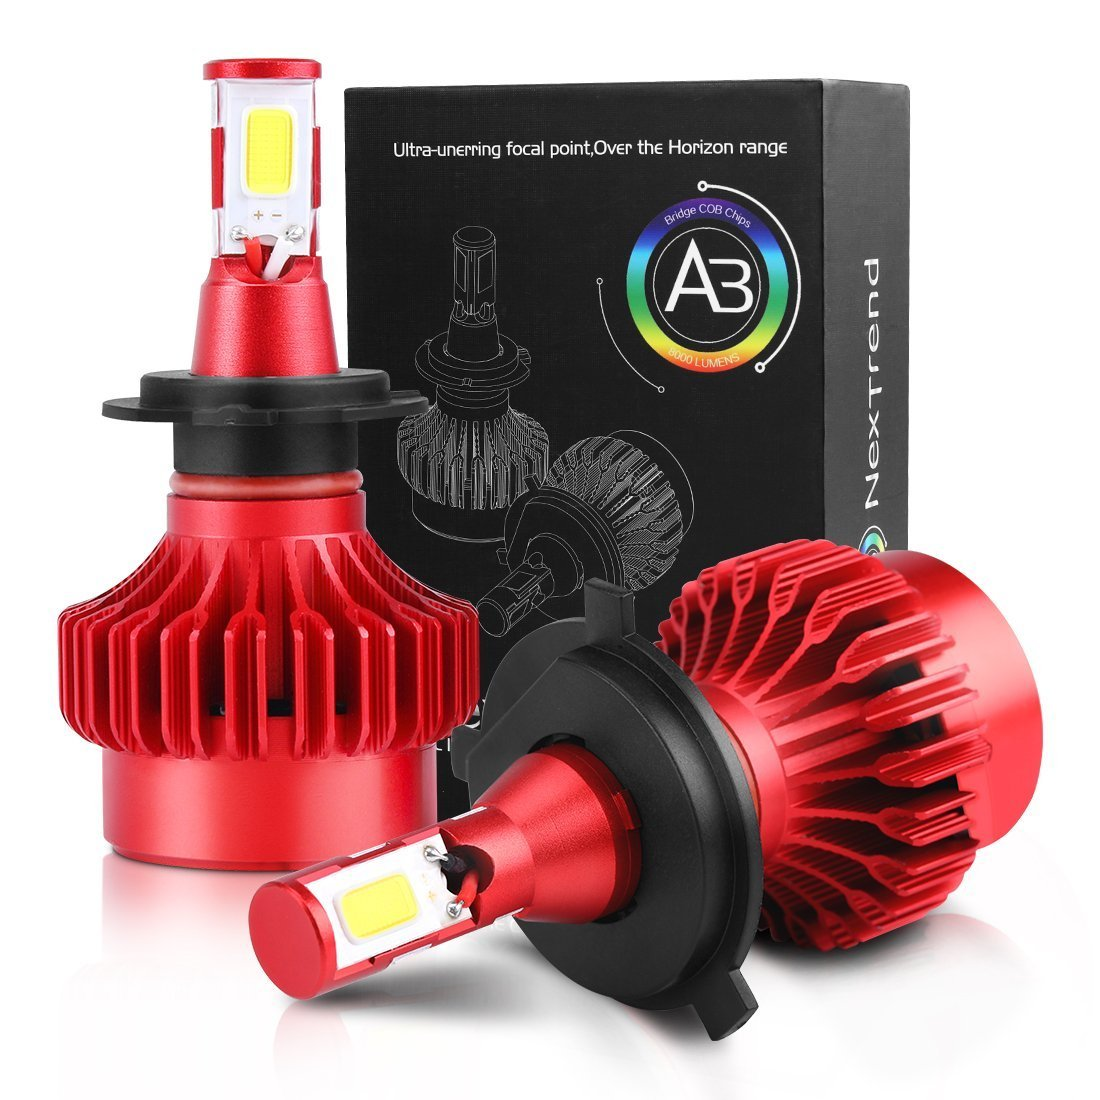 H4 9003 HB2 LED Headlight Bulbs 2 Packs 40W,NexTrend 360° Beam Angle 6000K 8000LM Bright White Light Led Headlight Bulb All-in-one Car Headlight Bulb Conversion Kit (40W 2 PACK),DC 9V-35V